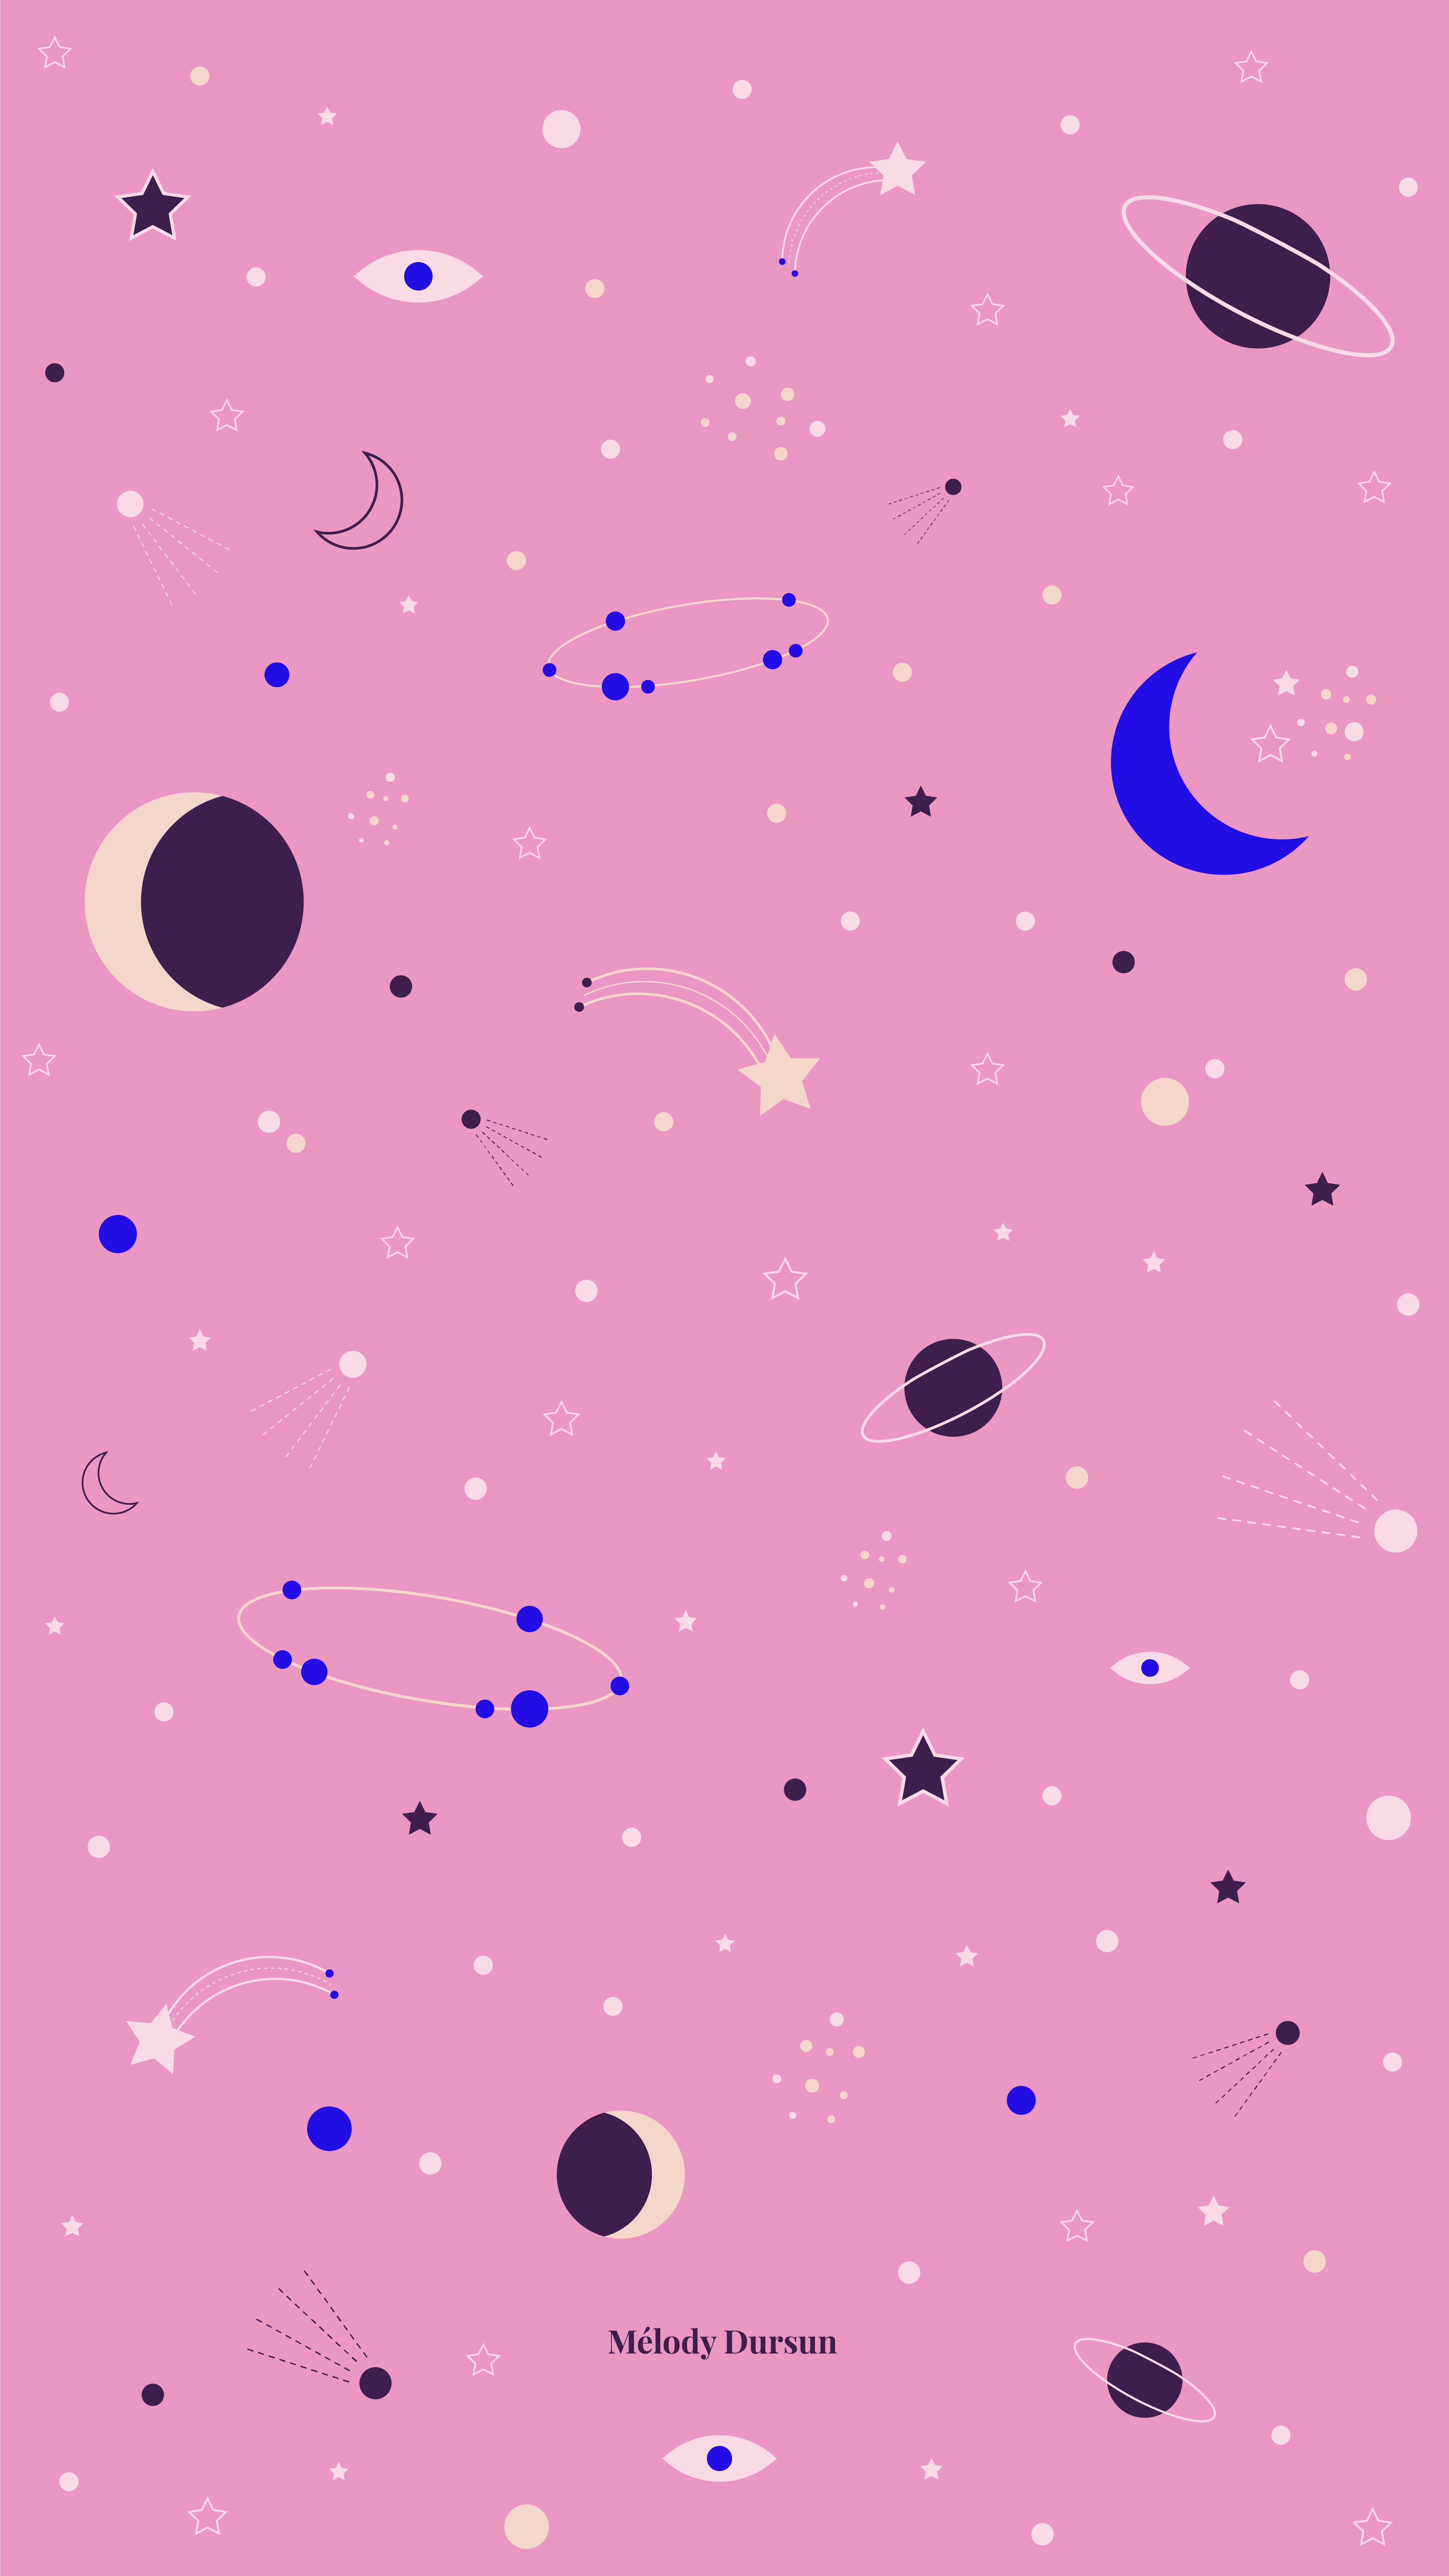 melodydursun-fond-janvier2019-Iphone6plus-pink